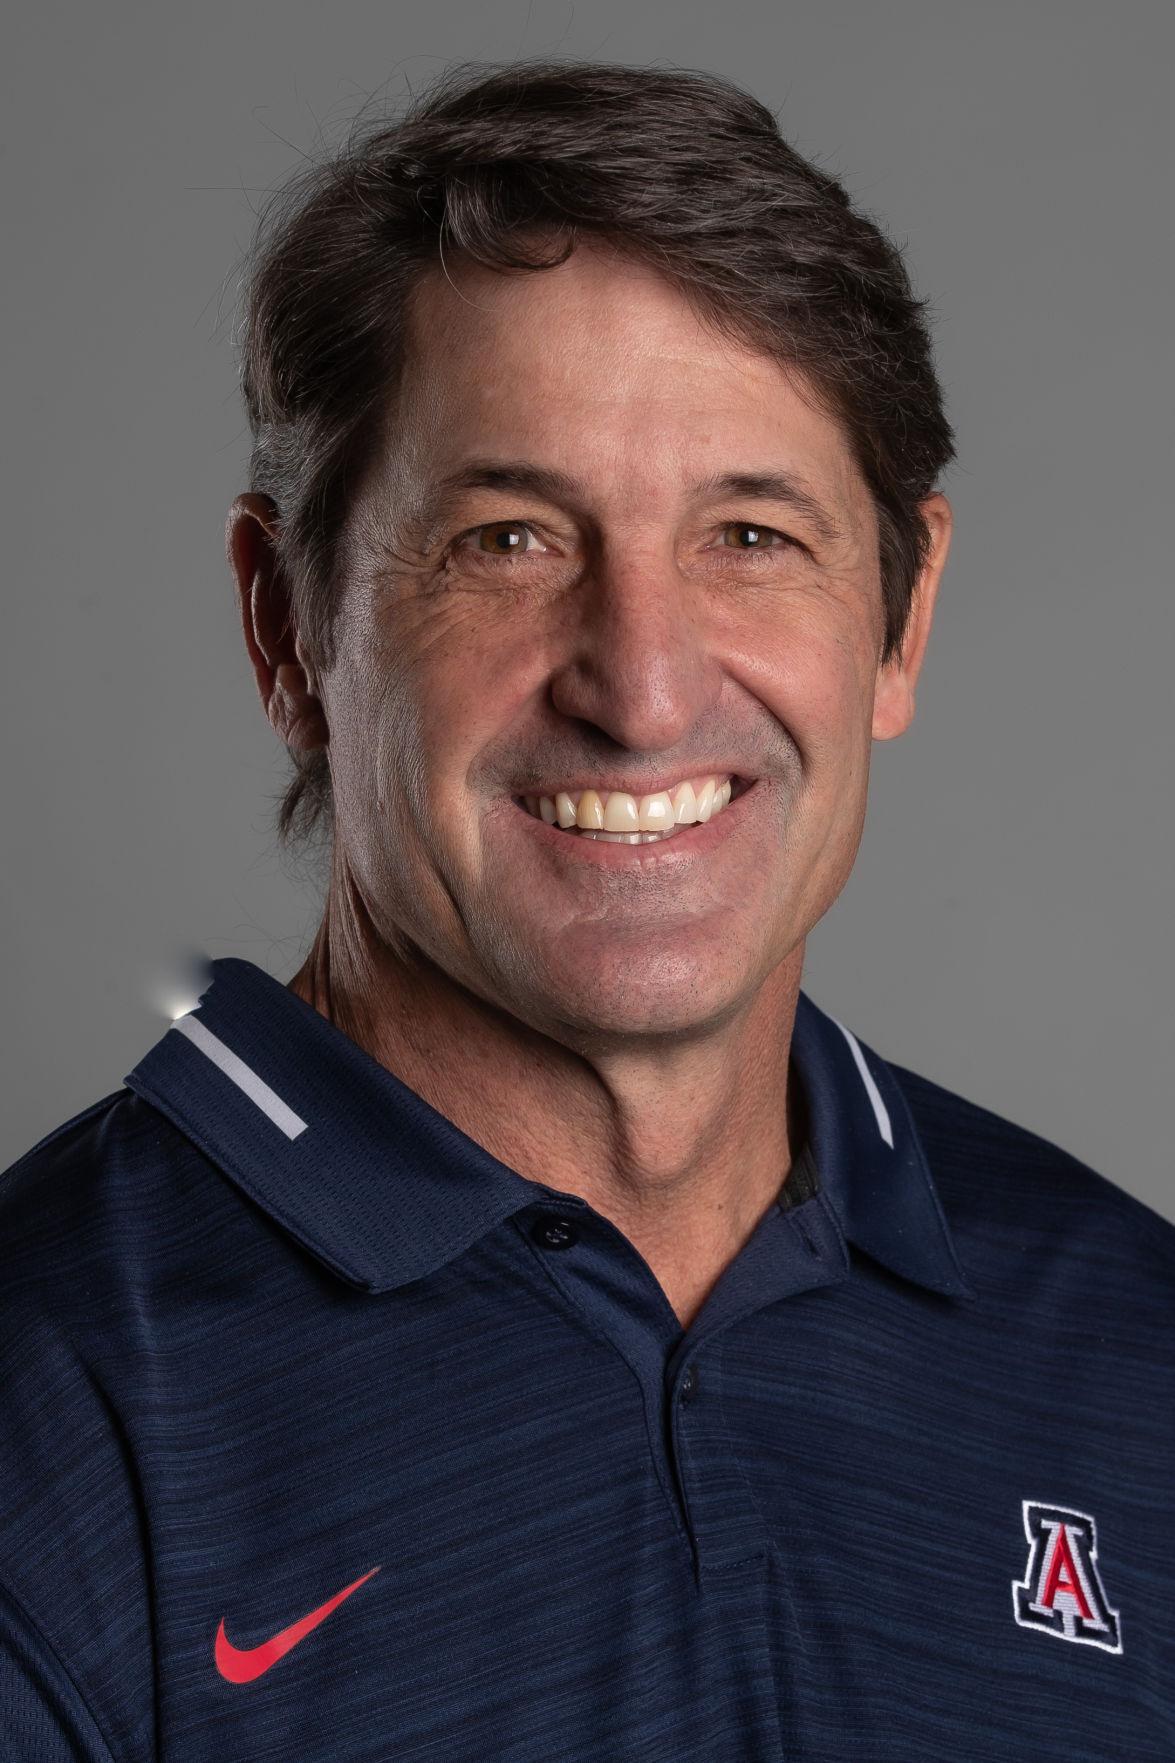 Chuck Cecil CROPPED 210114 Coaching Staff Headshots_Mike Christ